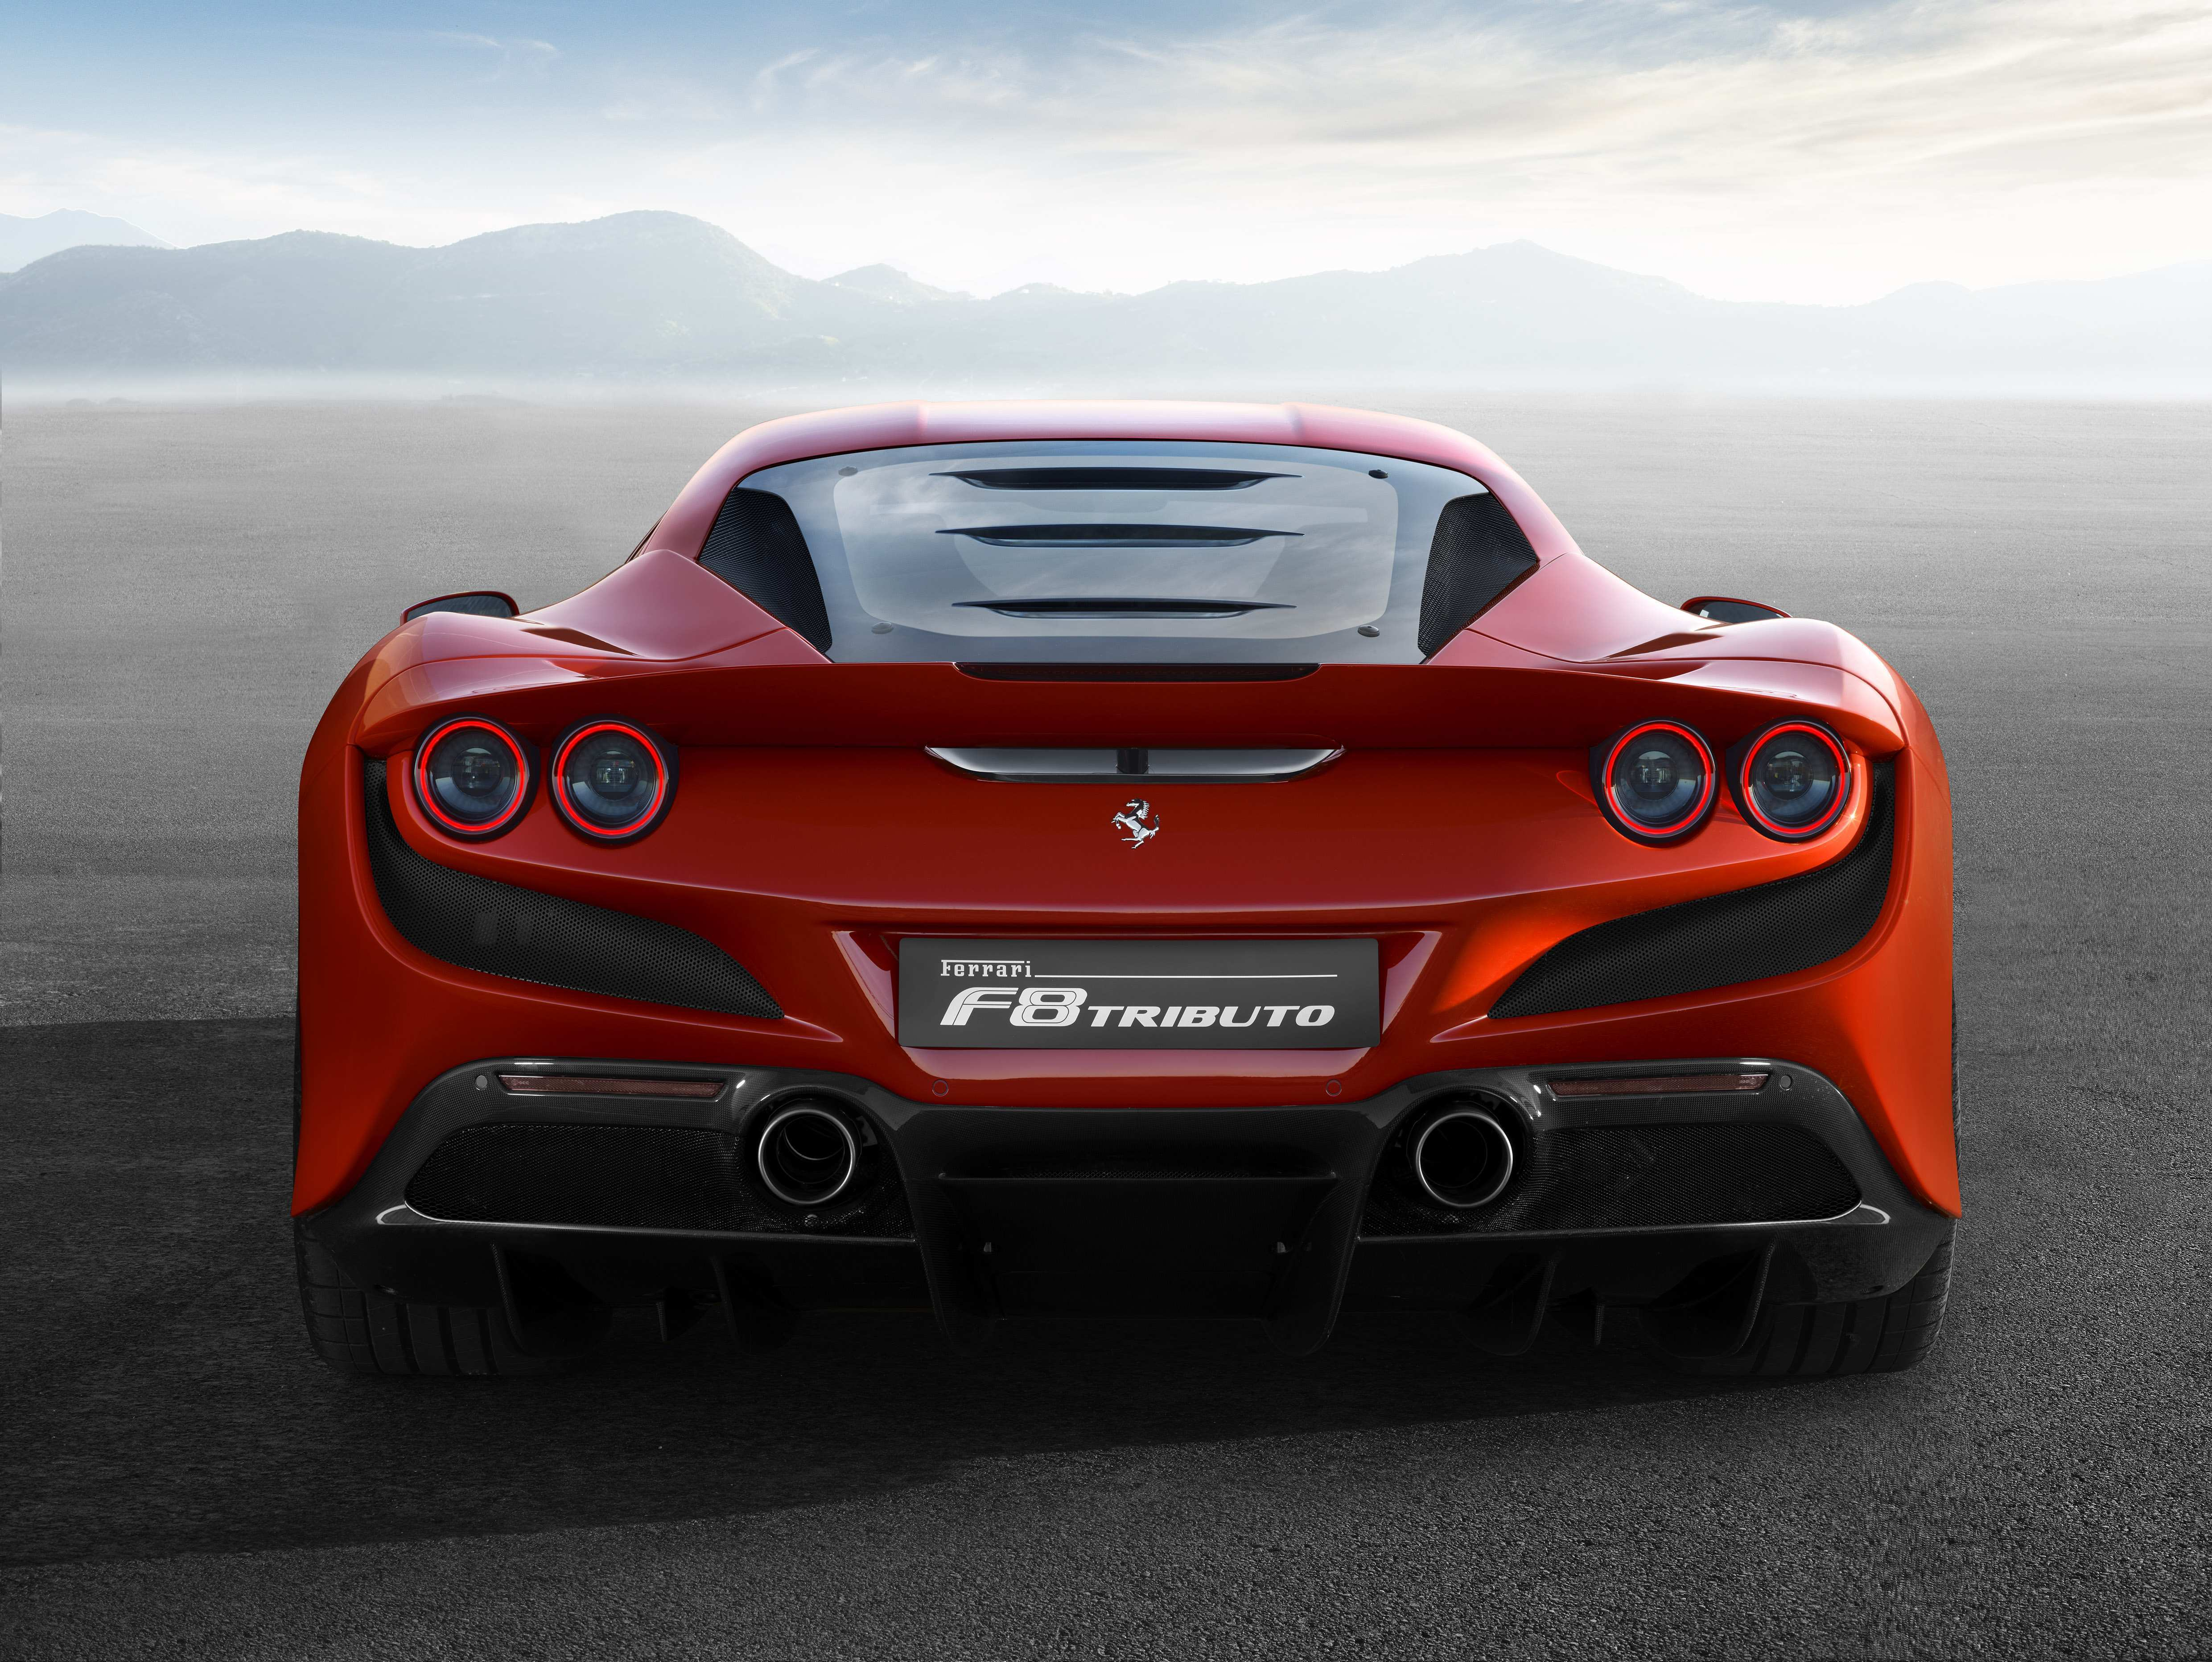 34 New Ferrari W 2020 Prices with Ferrari W 2020